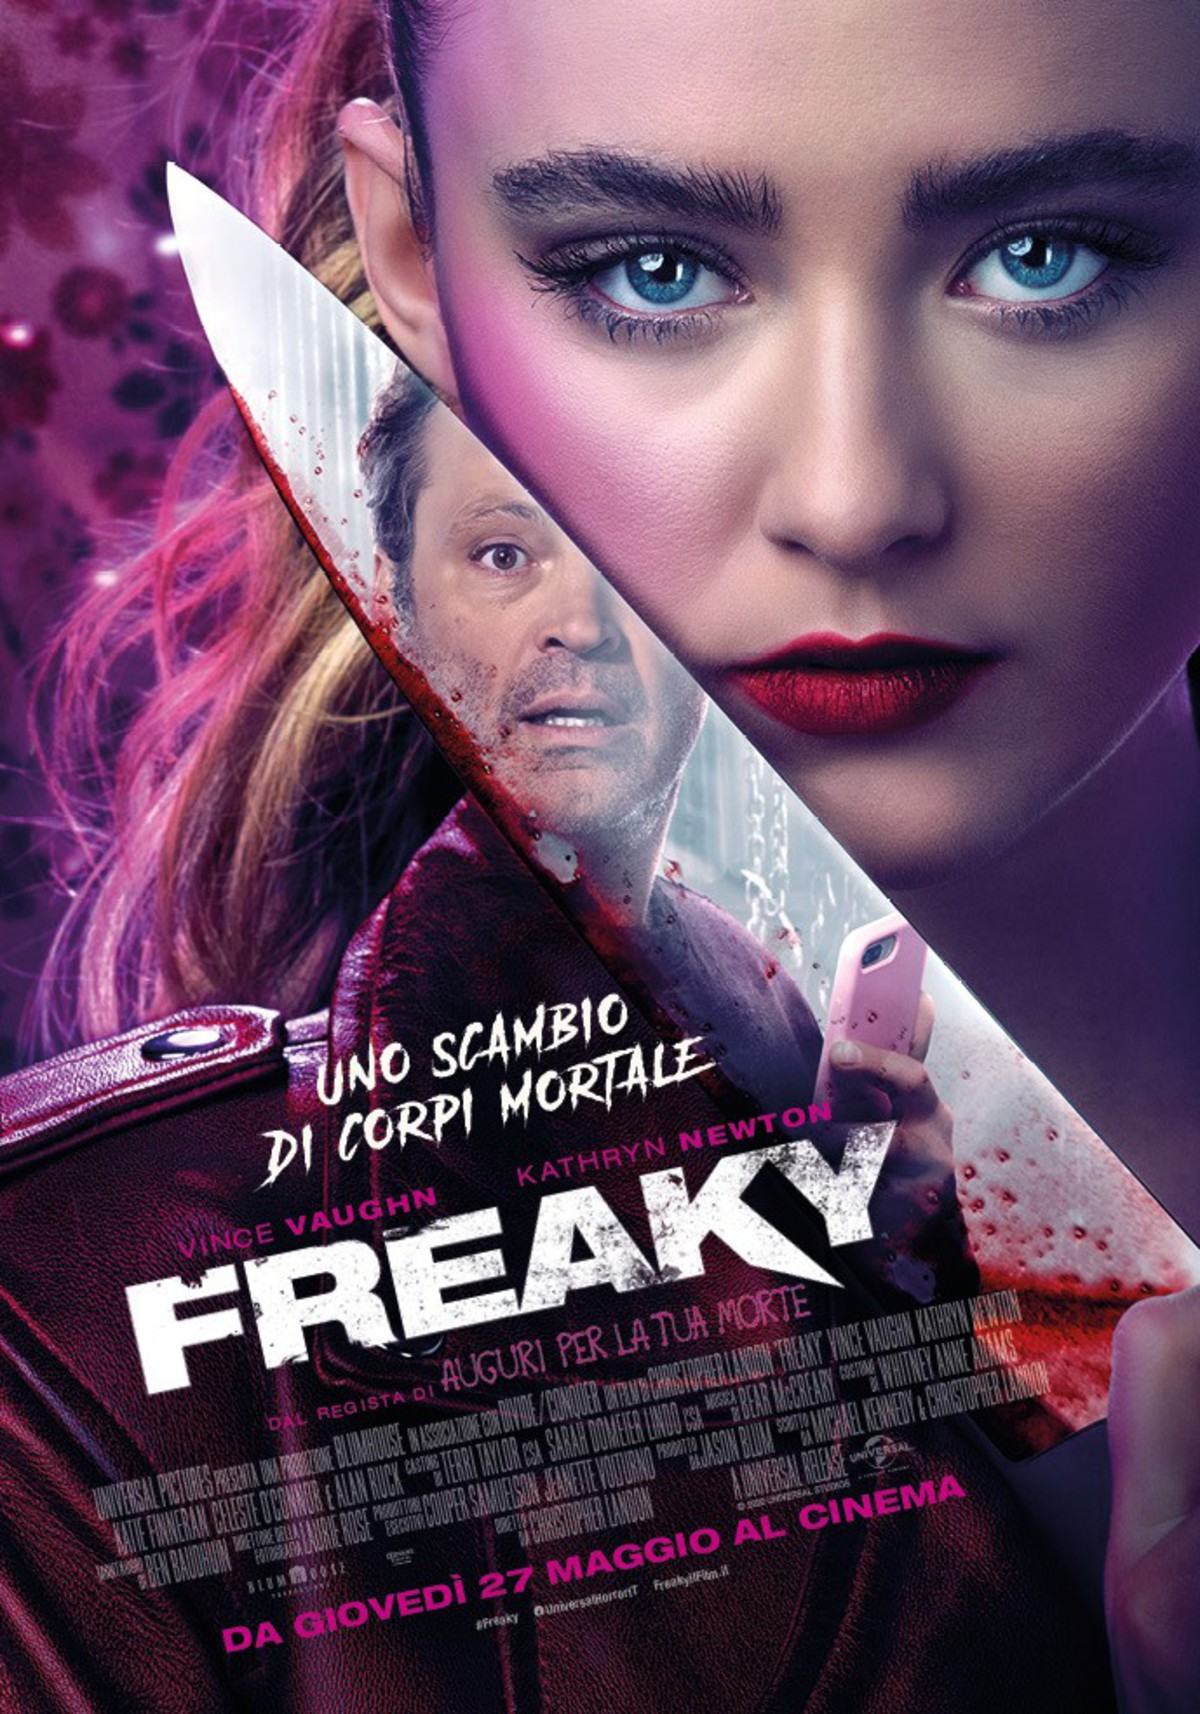 Film in uscita: Freaky